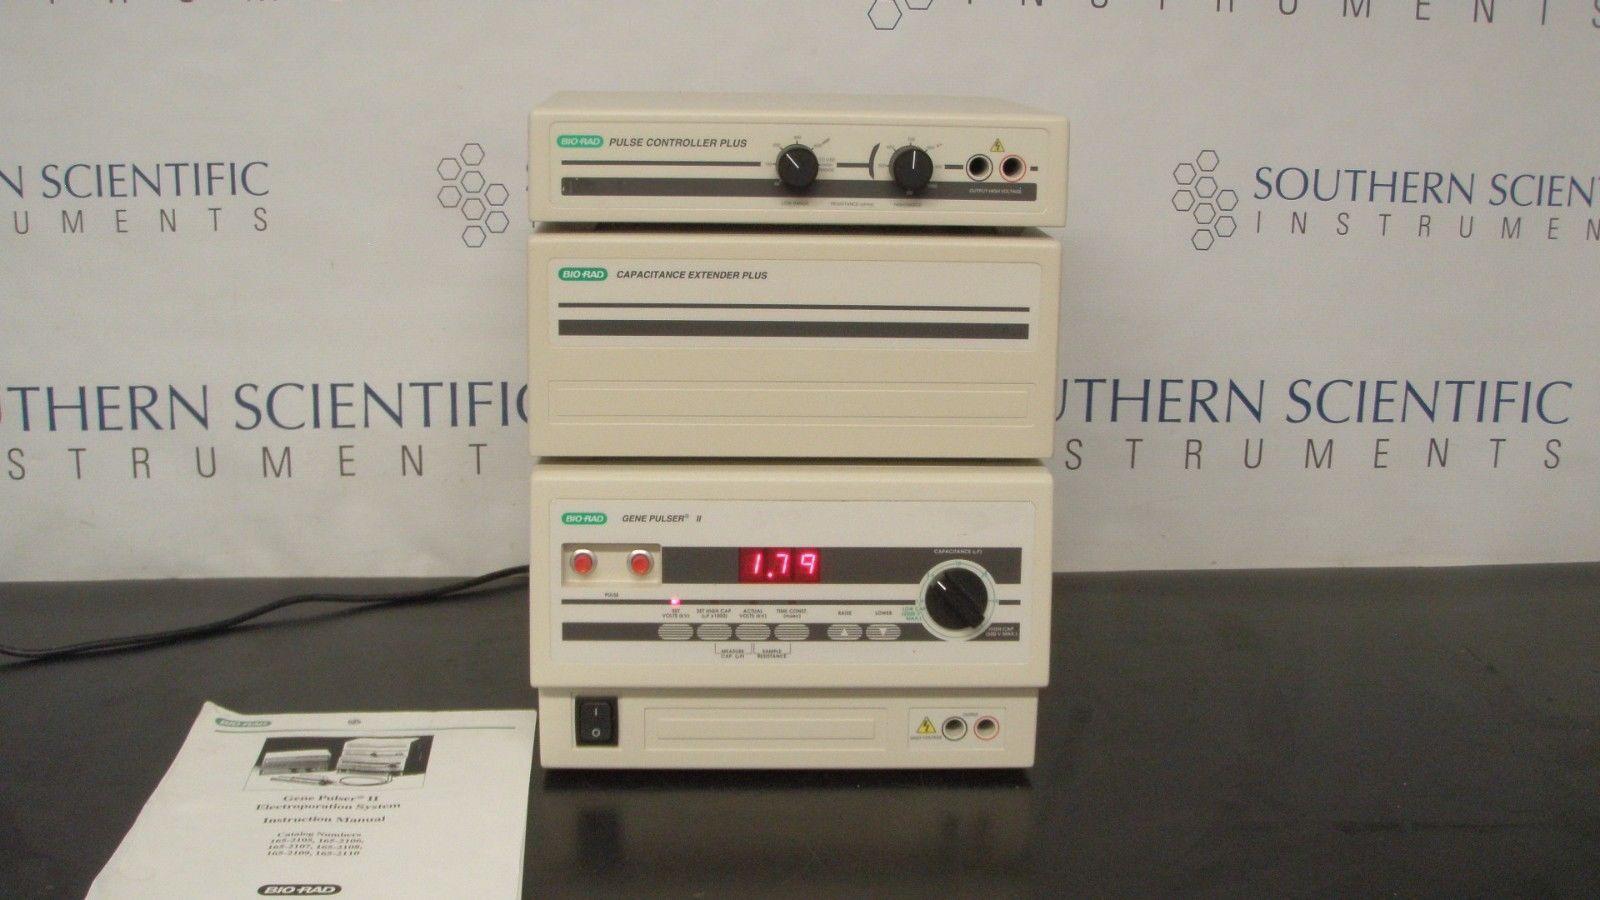 BIO RAD  Gene Pulser II Electroporation System